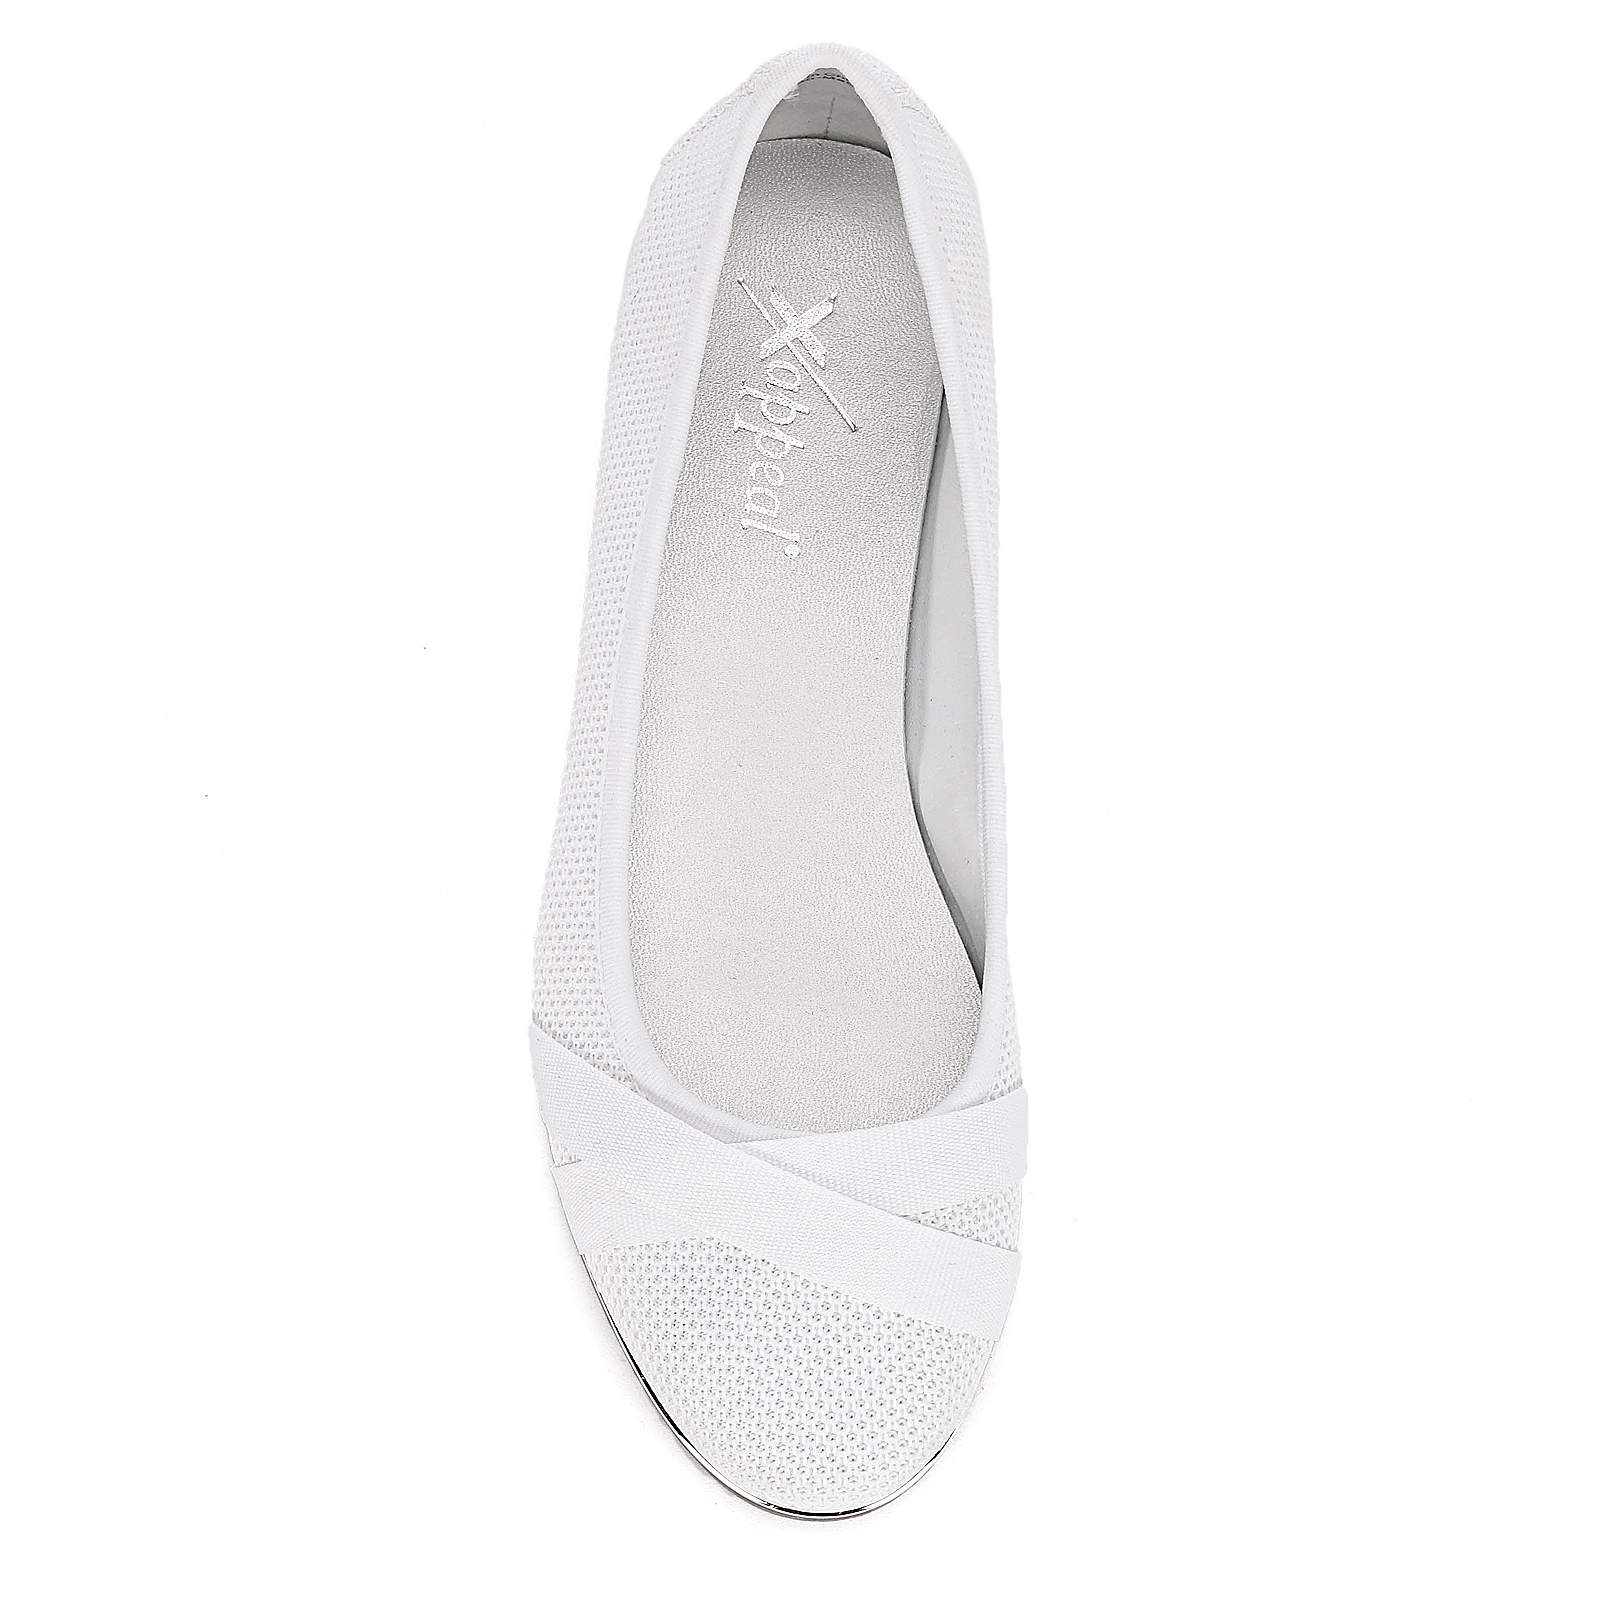 XAPPEAL-Womens-Mitzie-Slip-On-Mesh-Flat-Shoes thumbnail 14